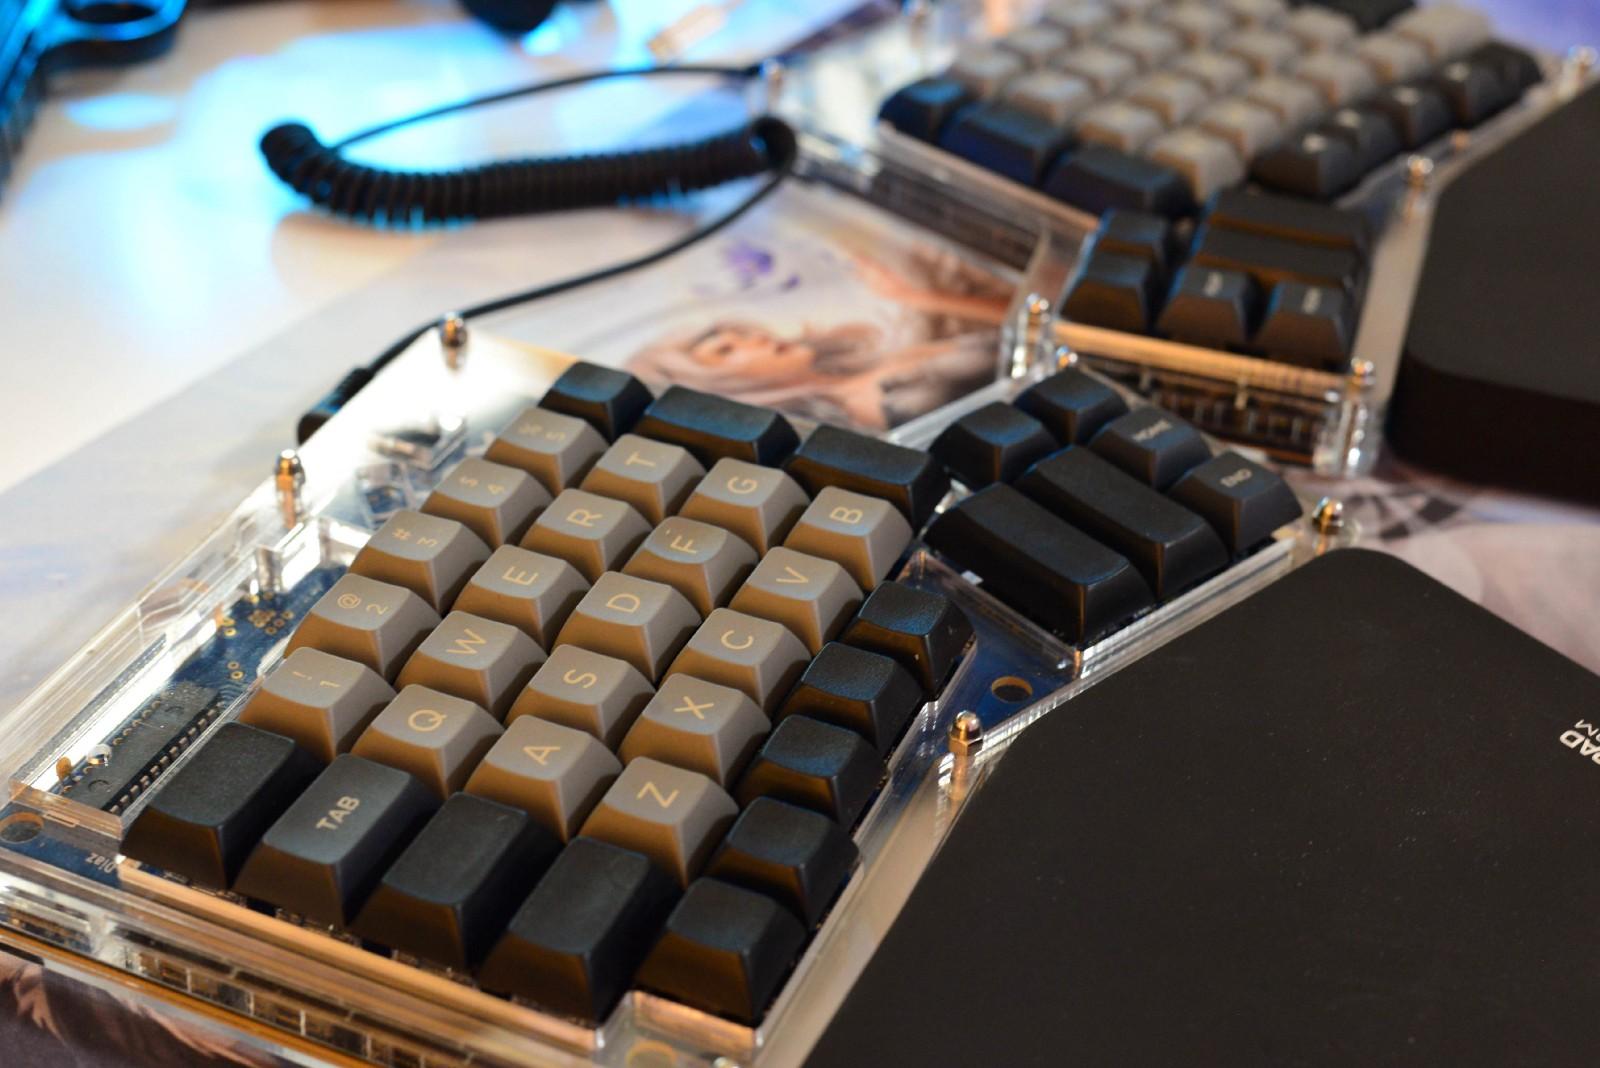 /mechanical-and-custom-built-keyboards-6343820da70d feature image